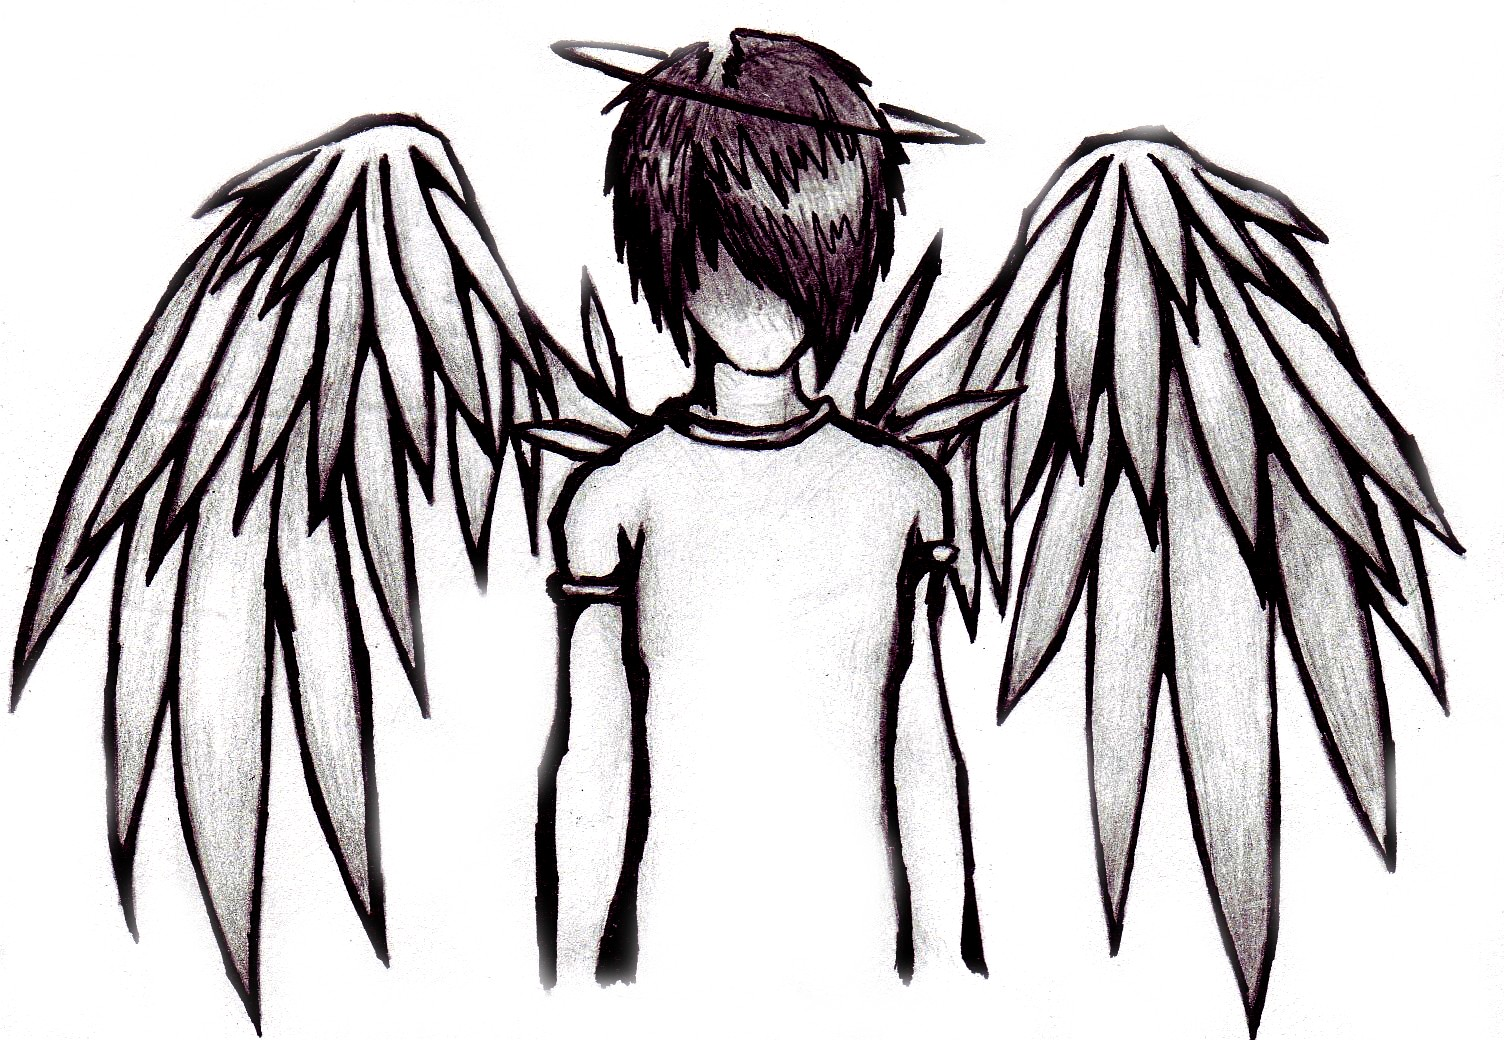 http://3.bp.blogspot.com/-2ZrcNUEJnK4/TbHr1_FTjAI/AAAAAAAAAKY/N6QUdQbkB64/s1600/Emo_Angel_Boy_by_Skissored.jpg